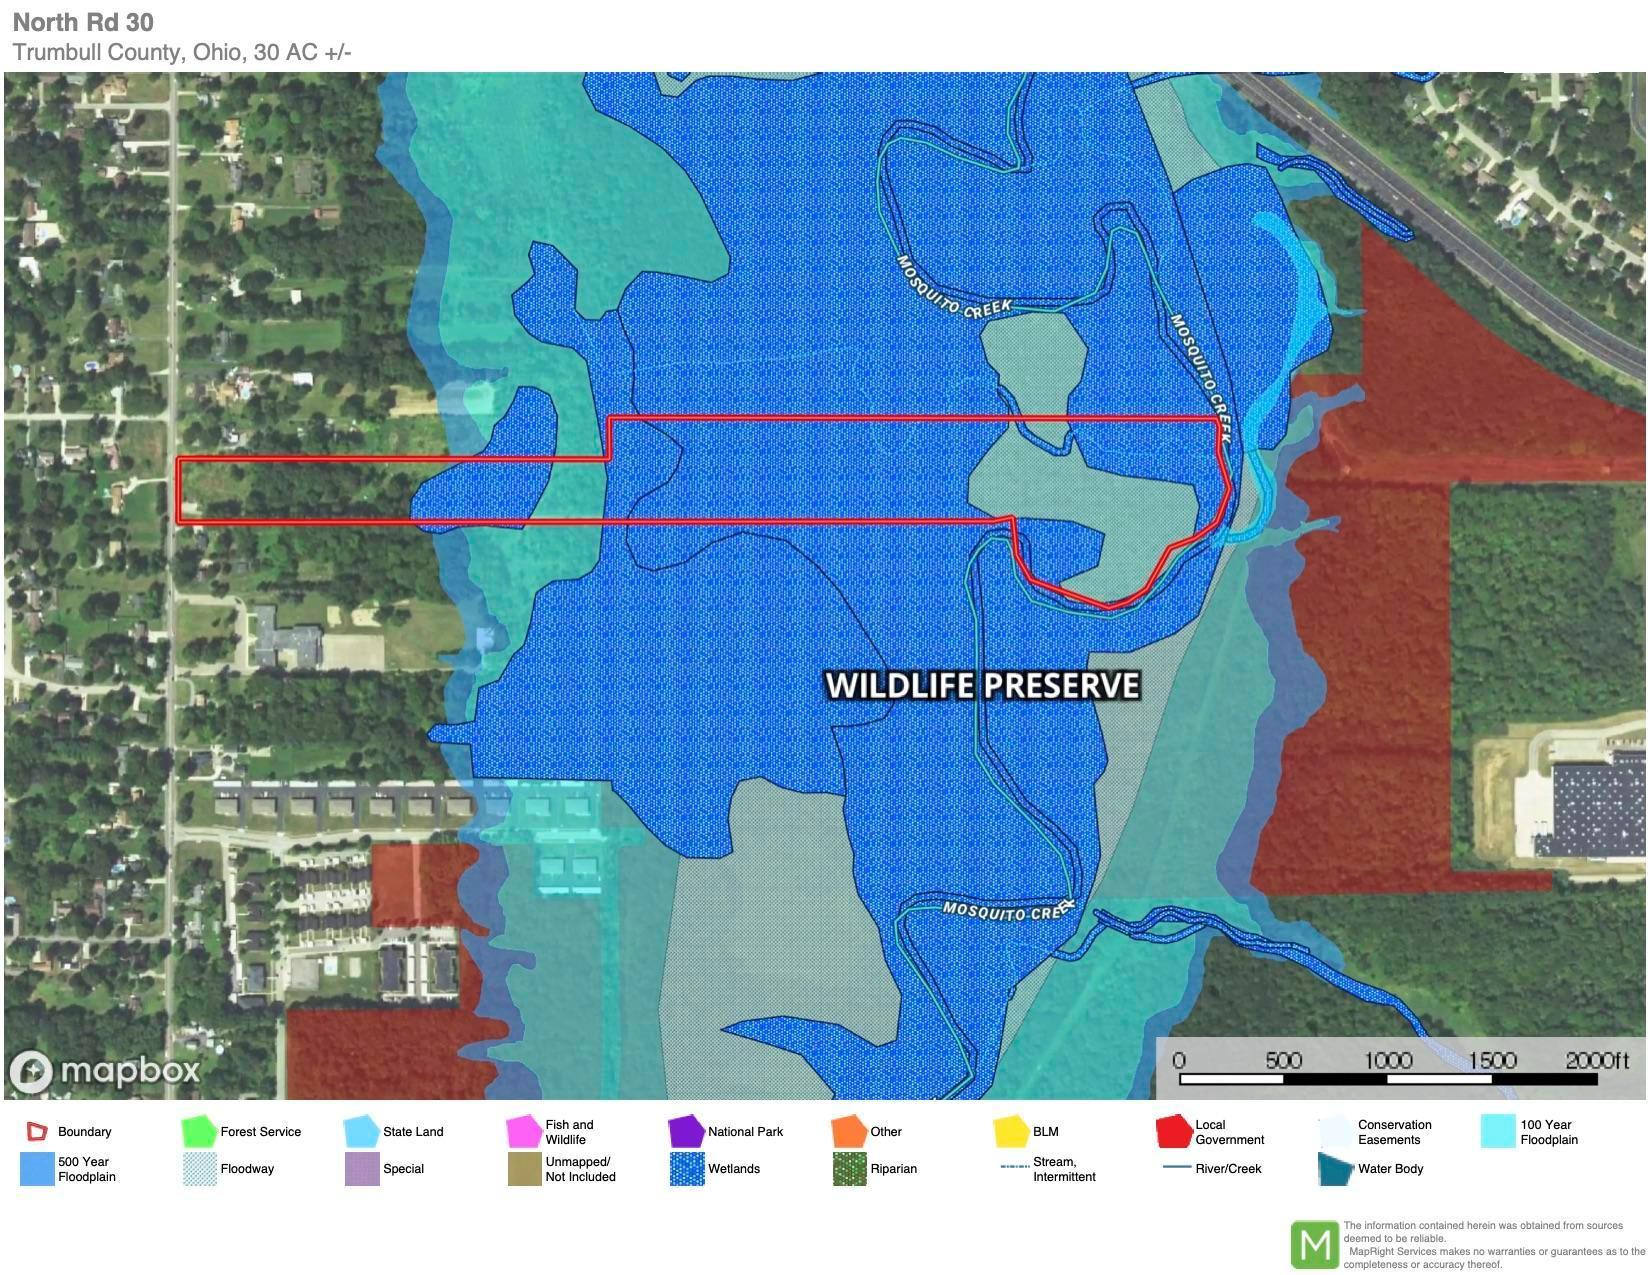 North Rd 30 Wetland and floodplain map c